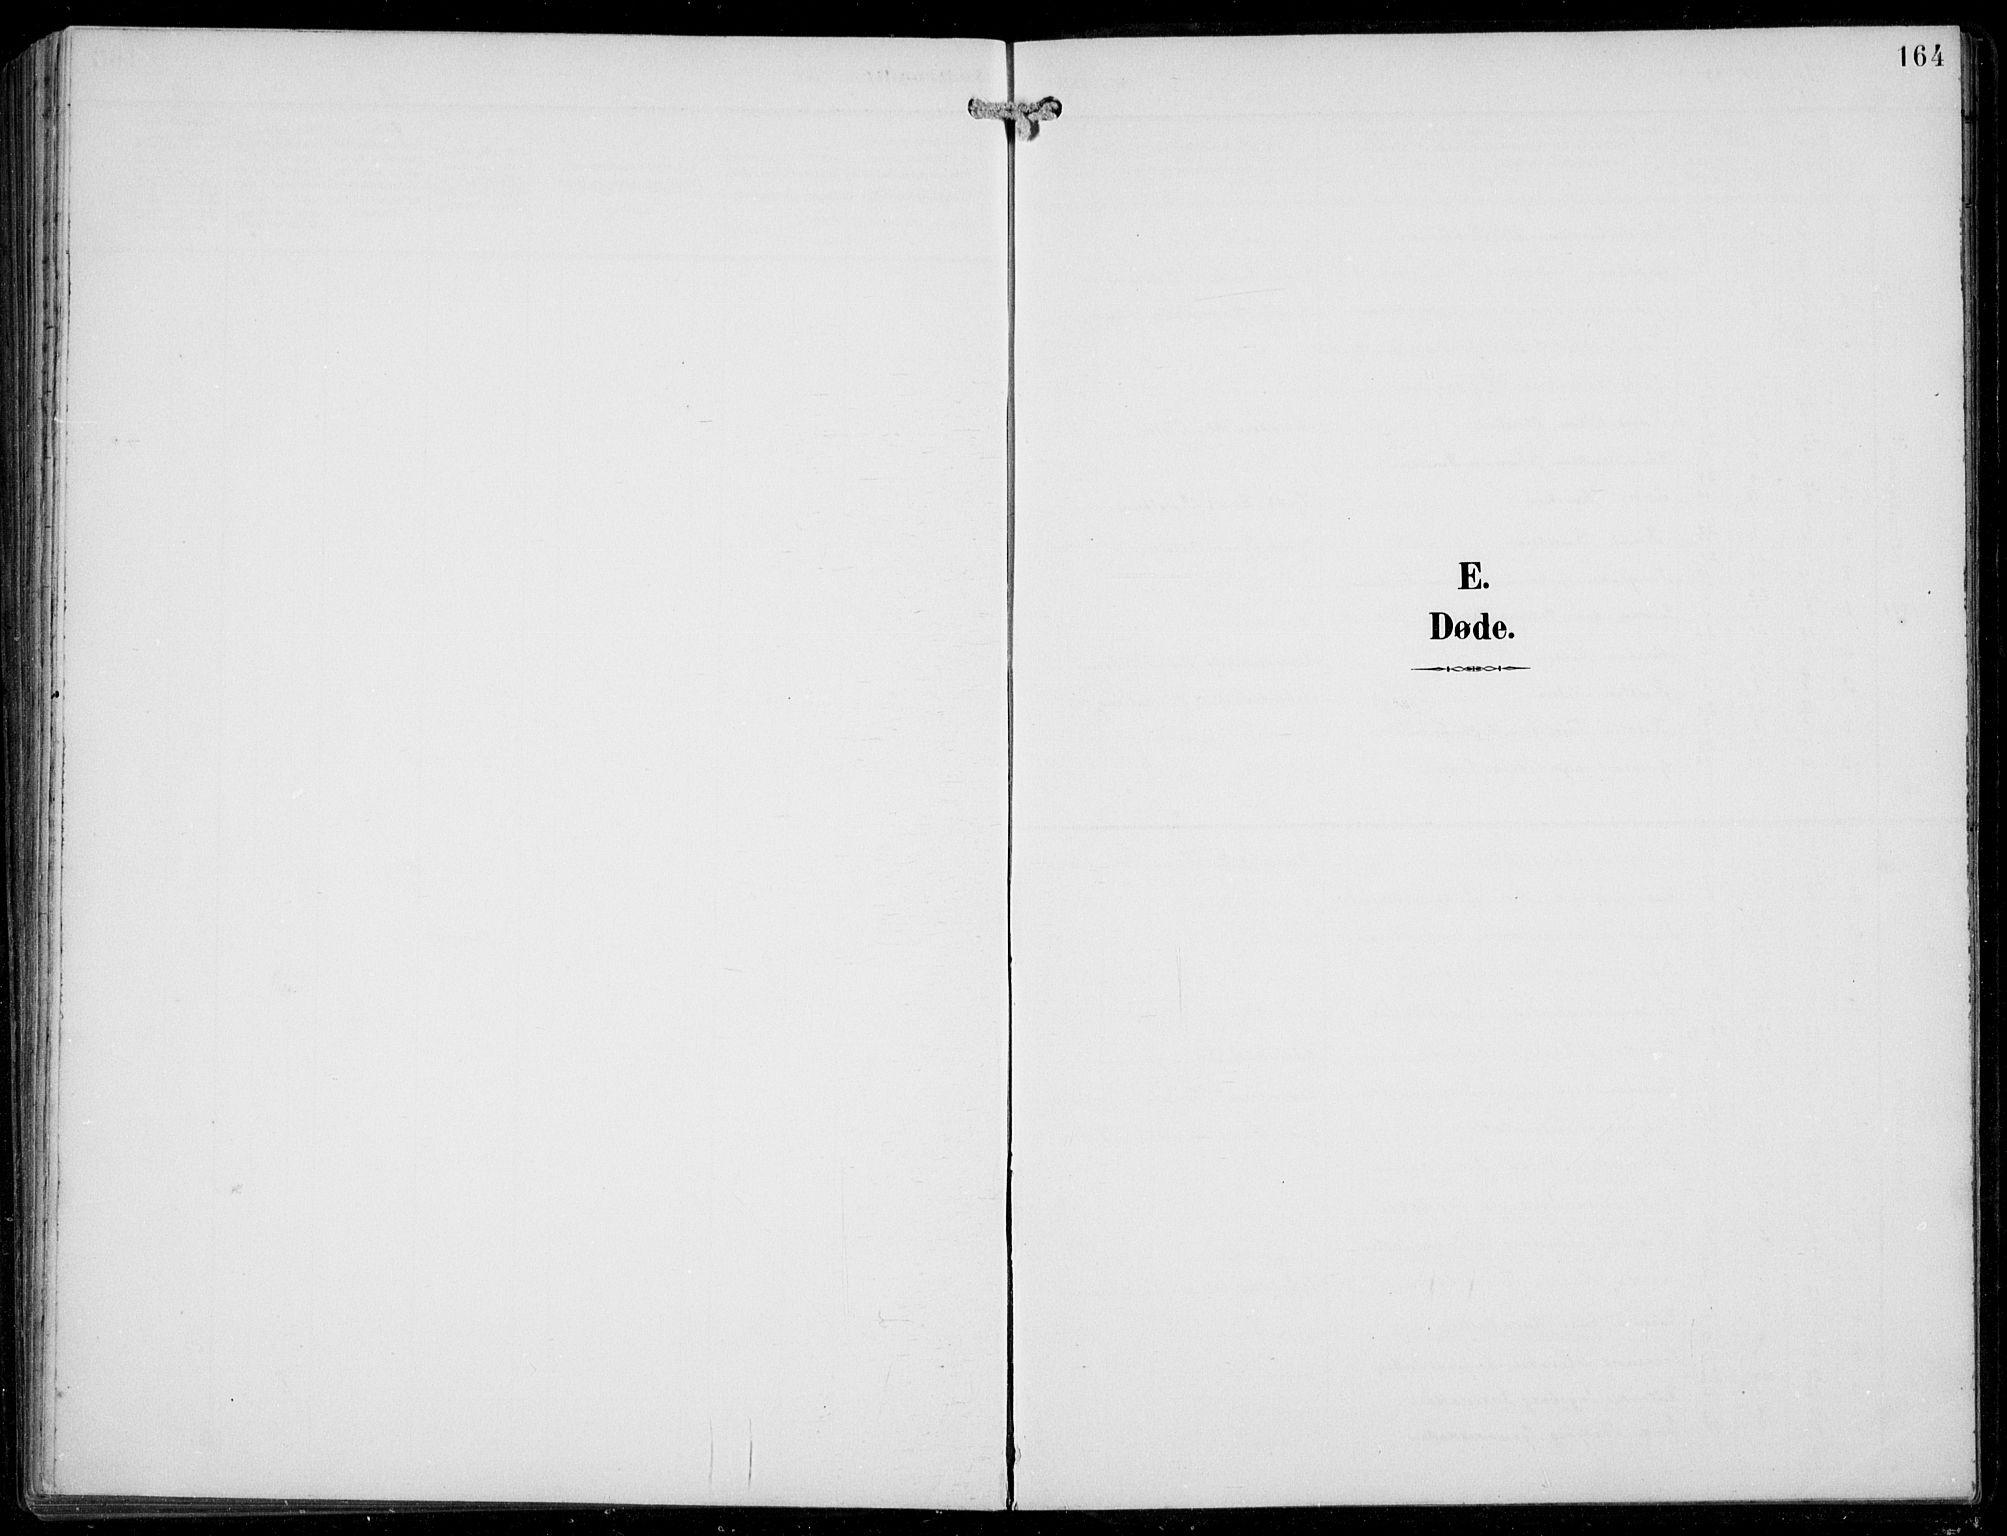 SAB, Aurland sokneprestembete, H/Hb/Hba/L0003: Klokkerbok nr. A 3, 1896-1939, s. 164